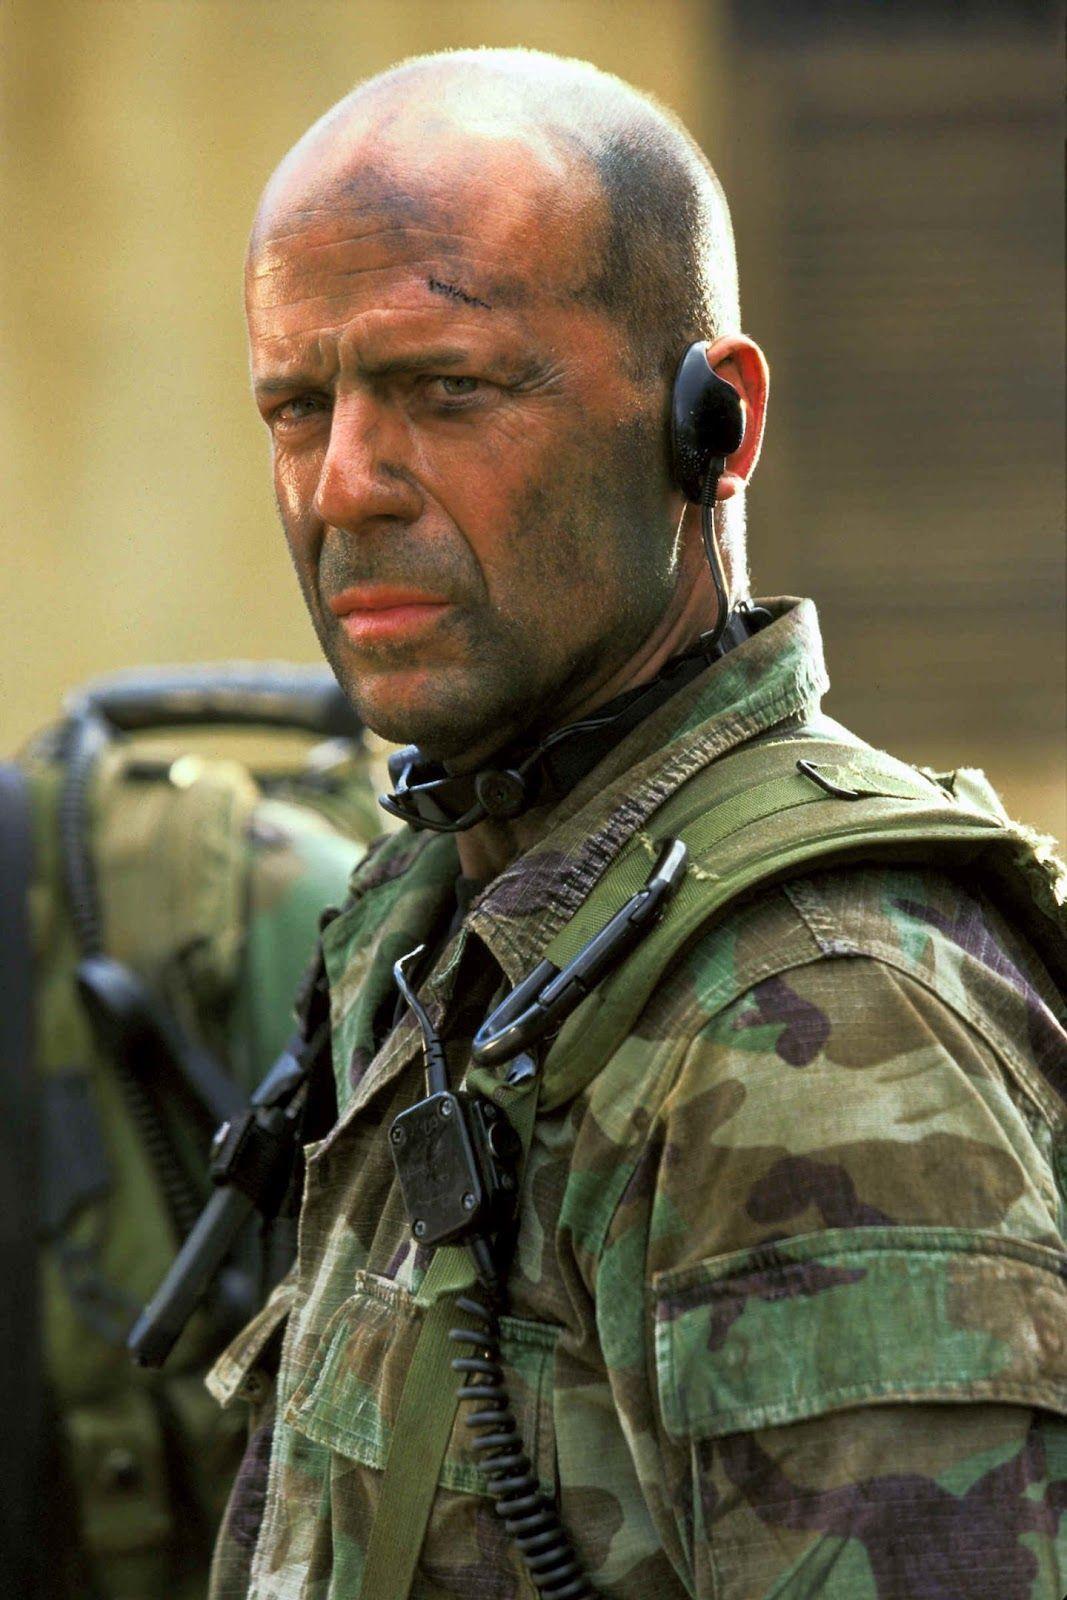 15 Best War Movies on Netflix 2019 - Top War Movies